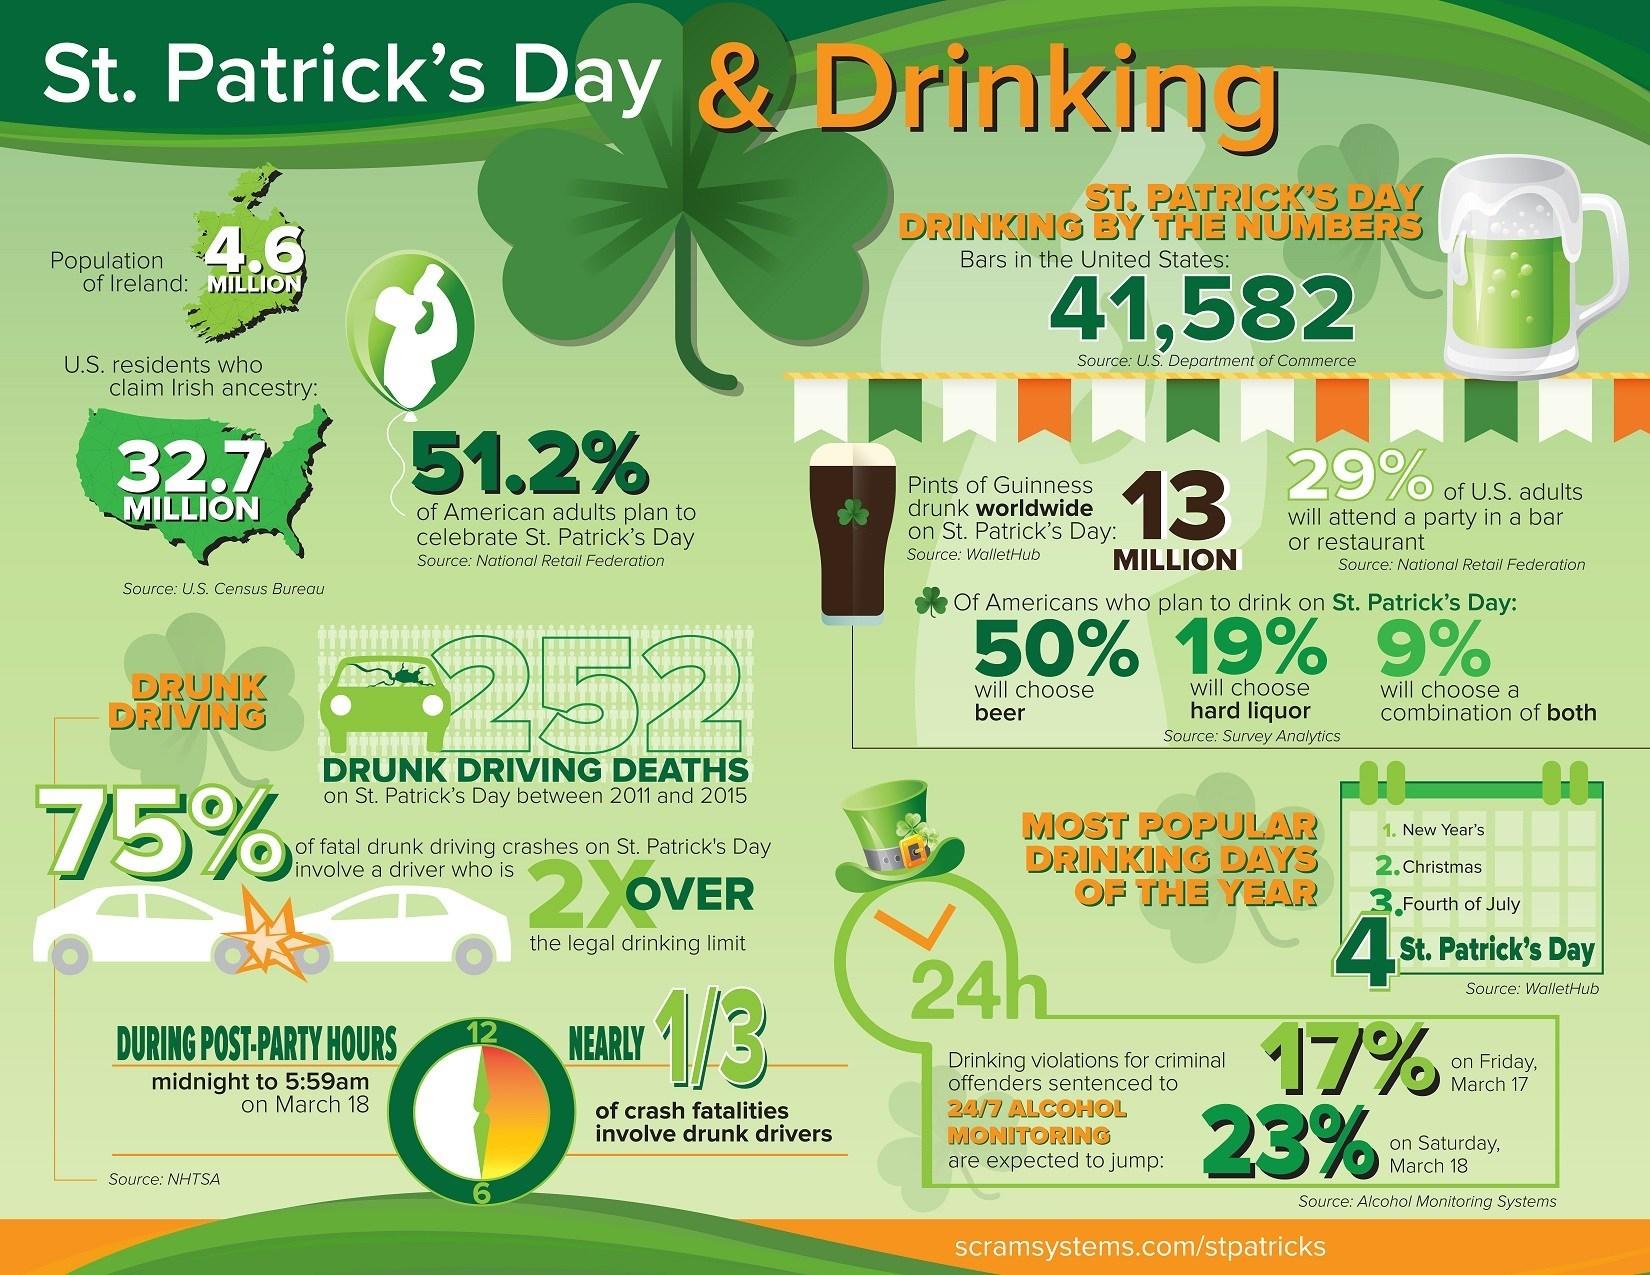 (PRNewsFoto/Alcohol Monitoring Systems, Inc.)